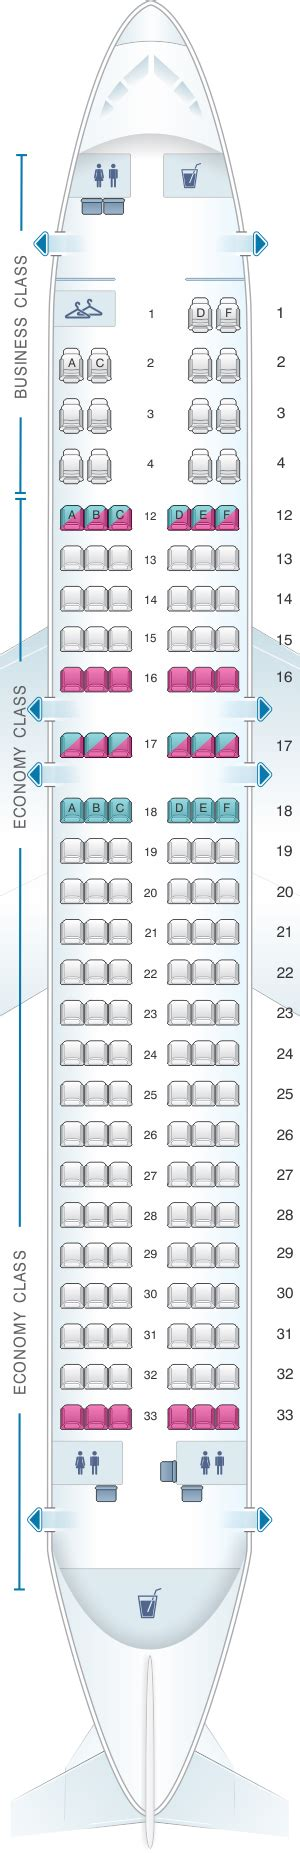 plan siege boeing 777 300er plan siege boeing 777 300er 100 images seatguru seat